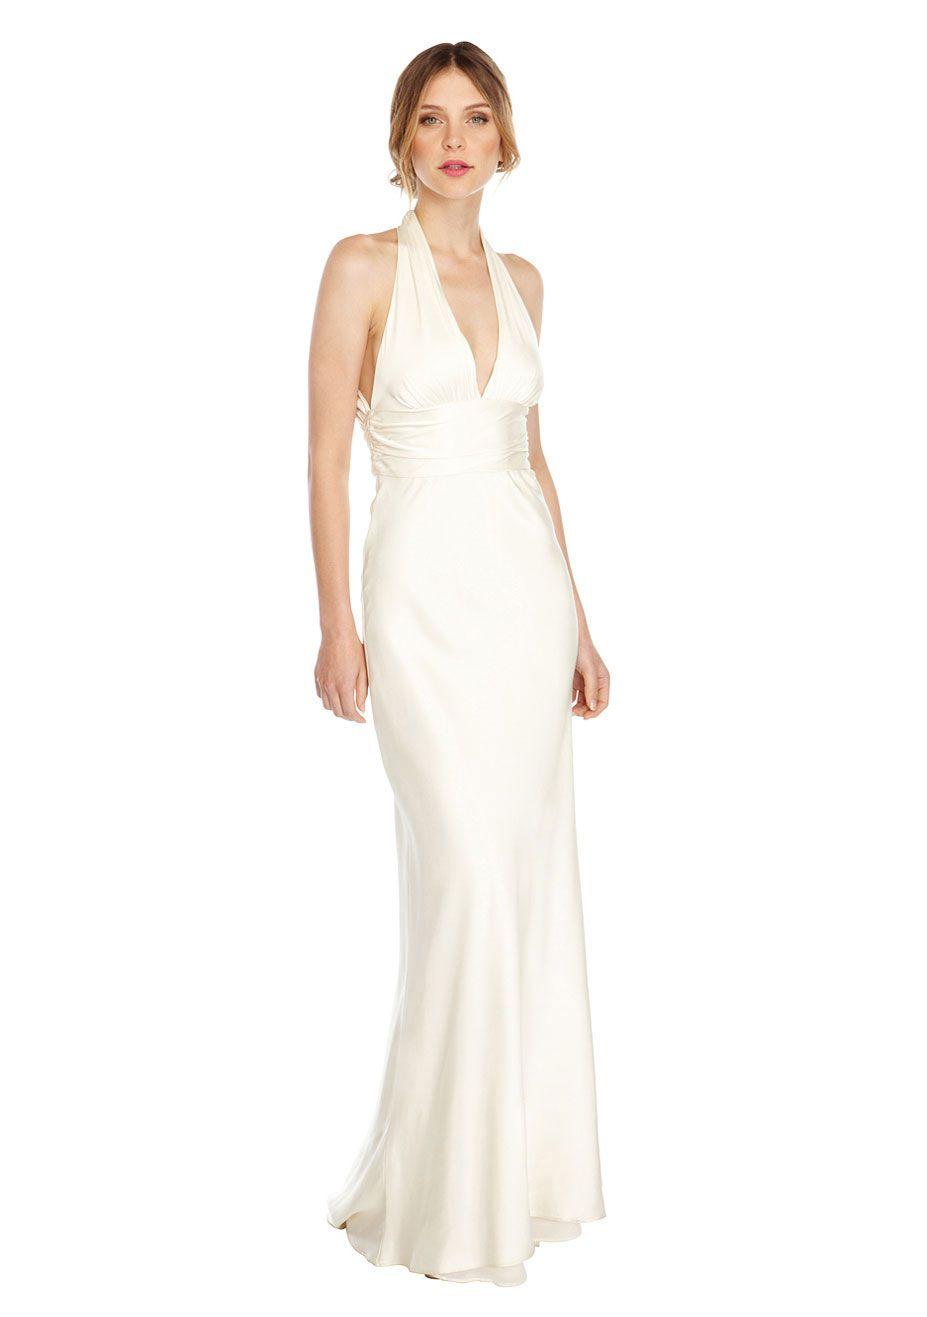 Double face satin bridal gown womenus designer clothes nicole